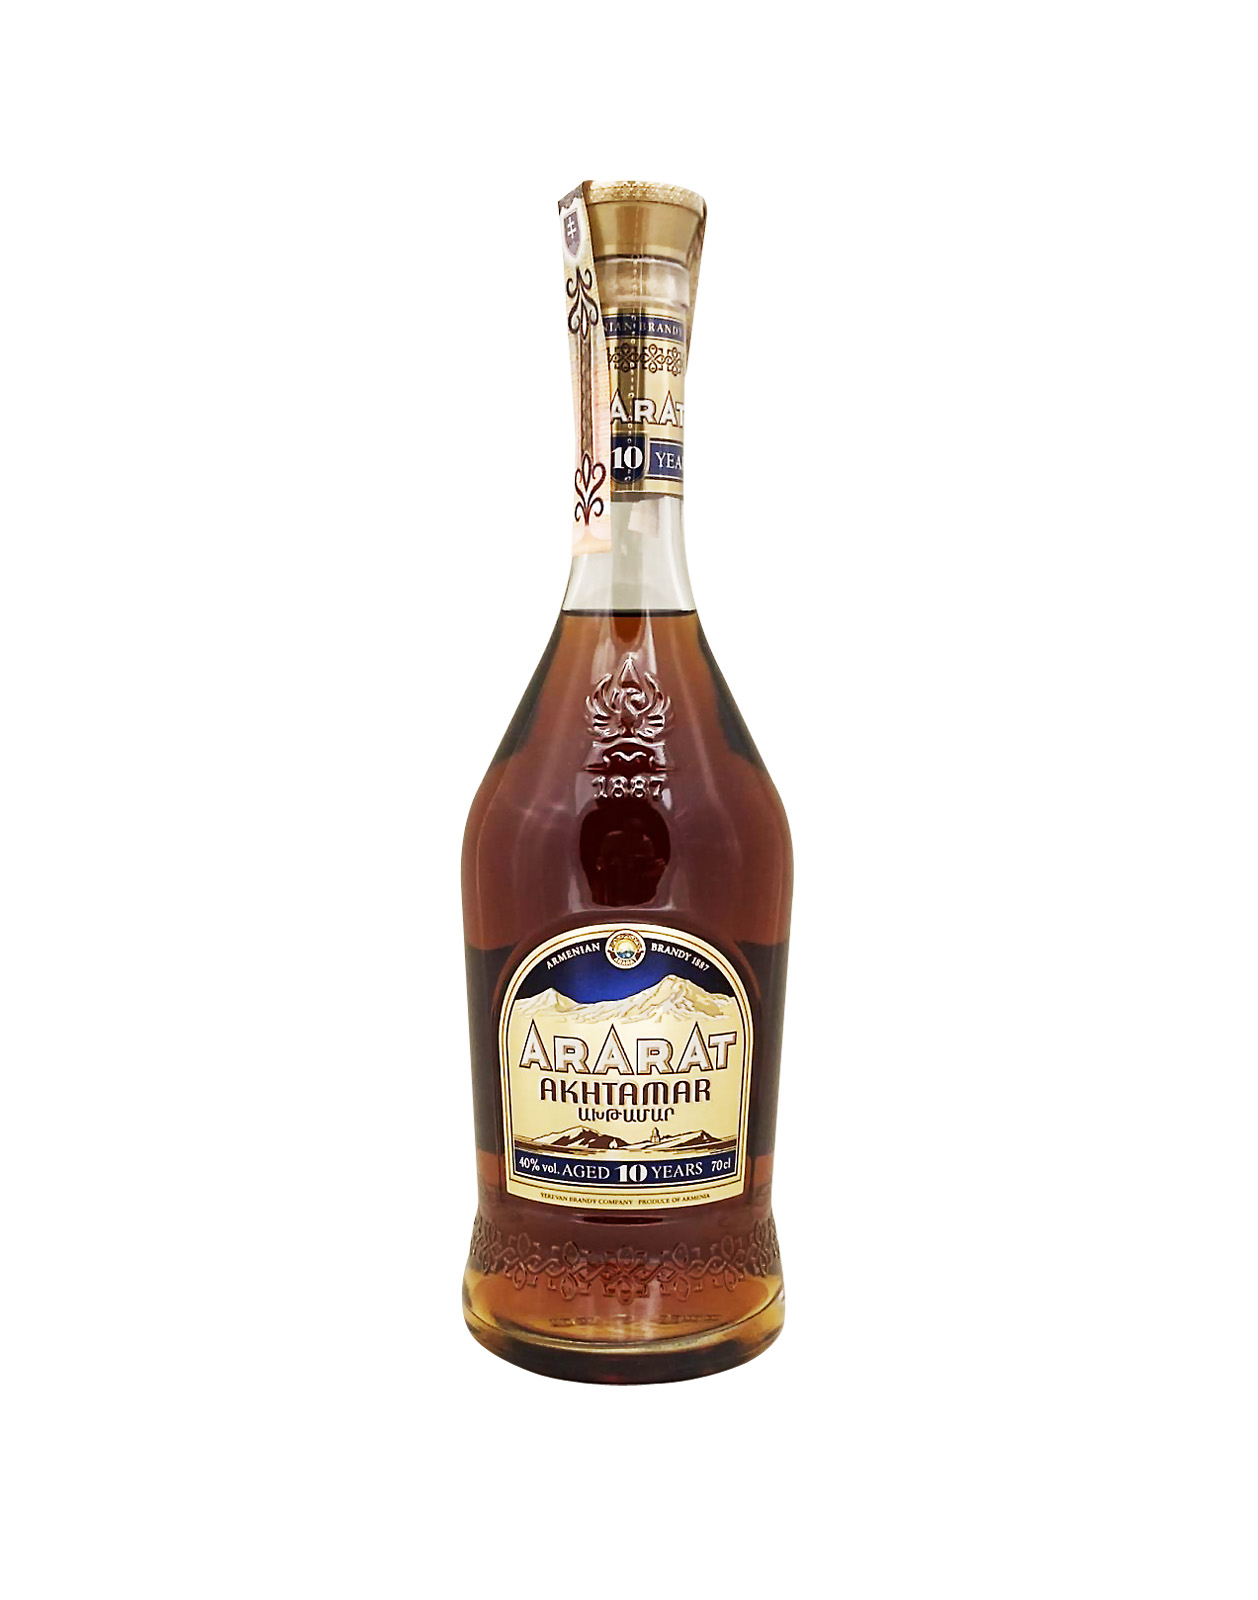 Ararat Akhtamar 10YO 40%, Bottleshop Sunny wines slnecnice mesto, petrzalka, koňak, rozvoz alkoholu, eshop